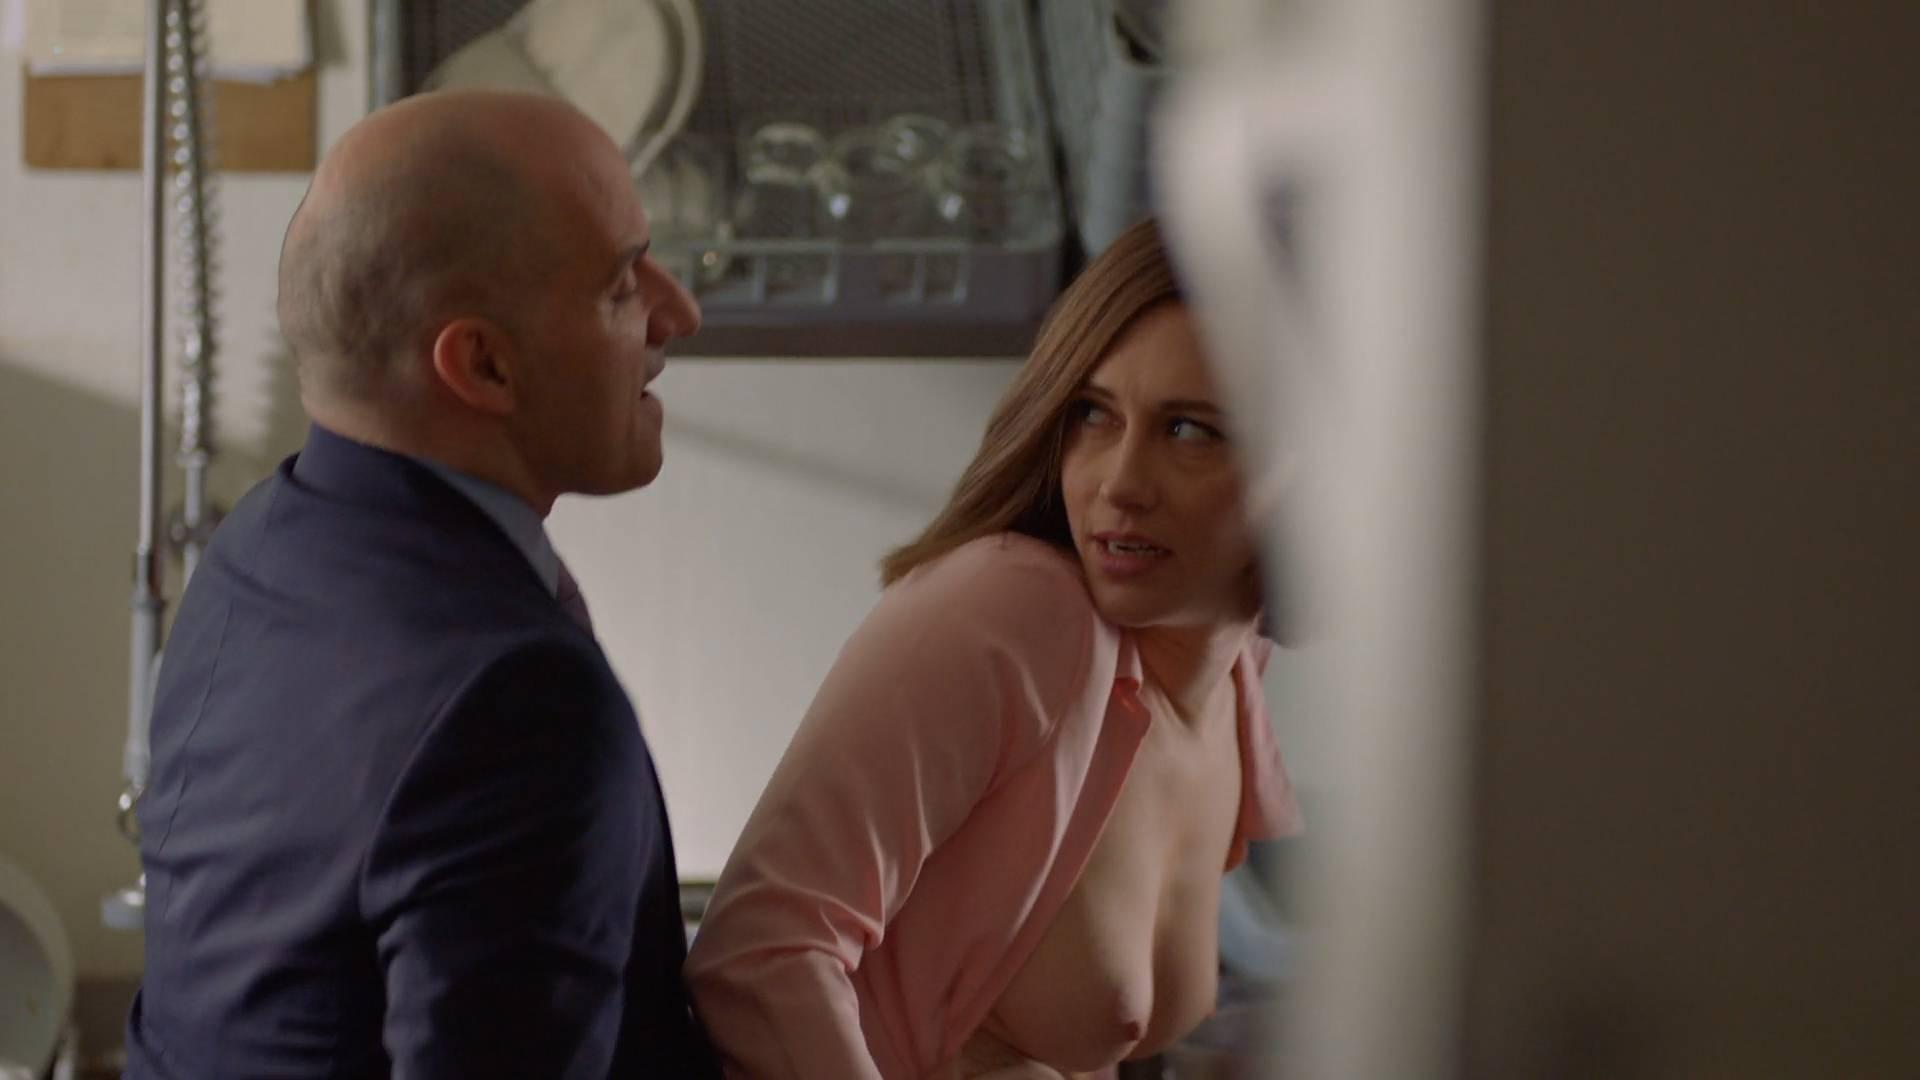 Remarkable, rather Becca sallie videos sex were